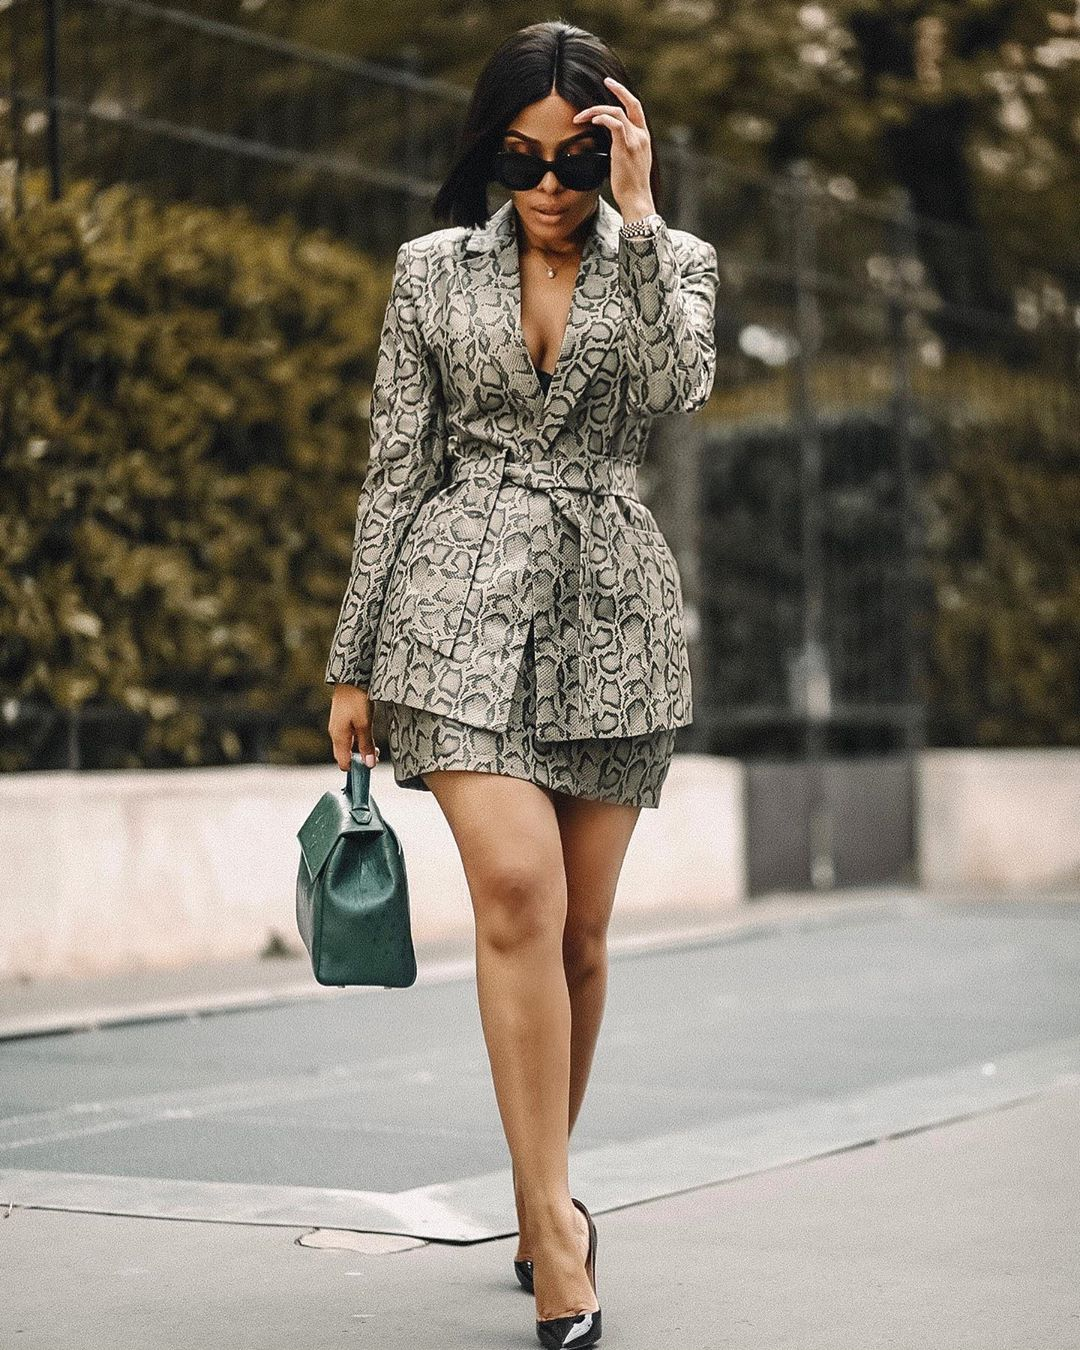 kefilwe-mabote-stylish-south-african-celebrity